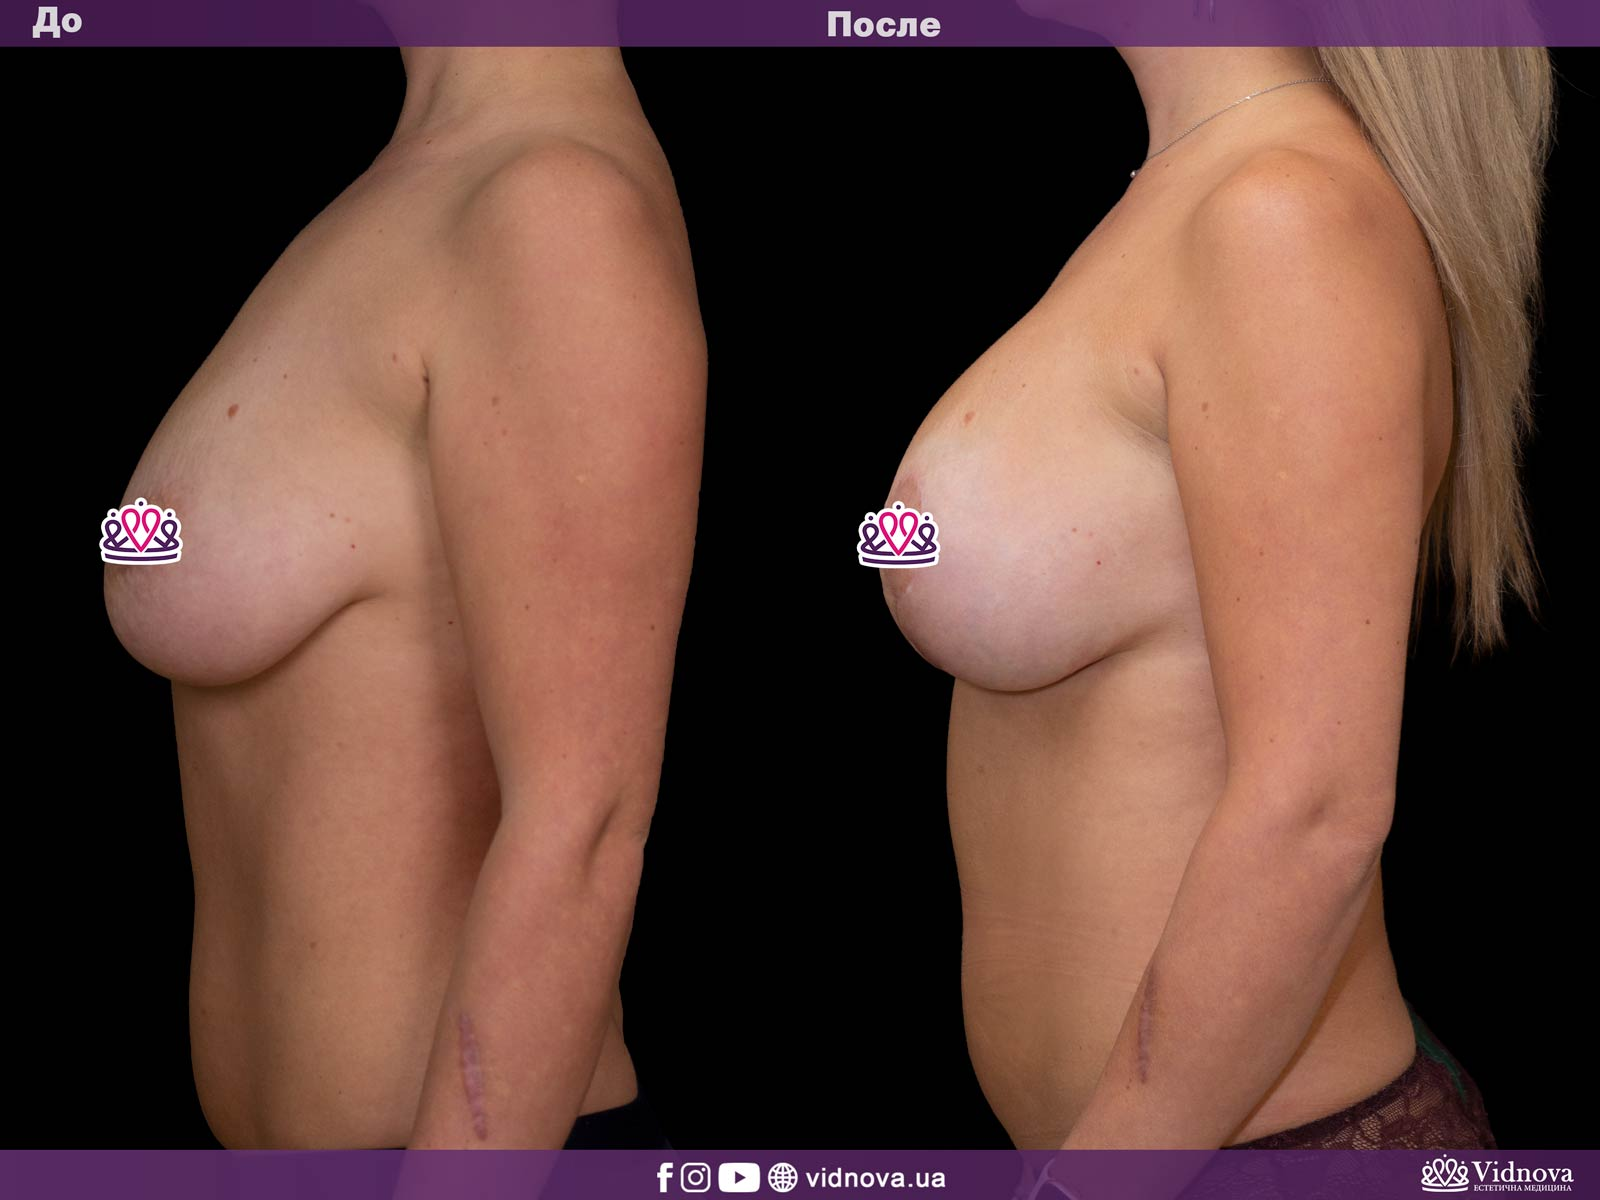 Подтяжка груди: Фото ДО и ПОСЛЕ - Пример №6-3 - Клиника Vidnova